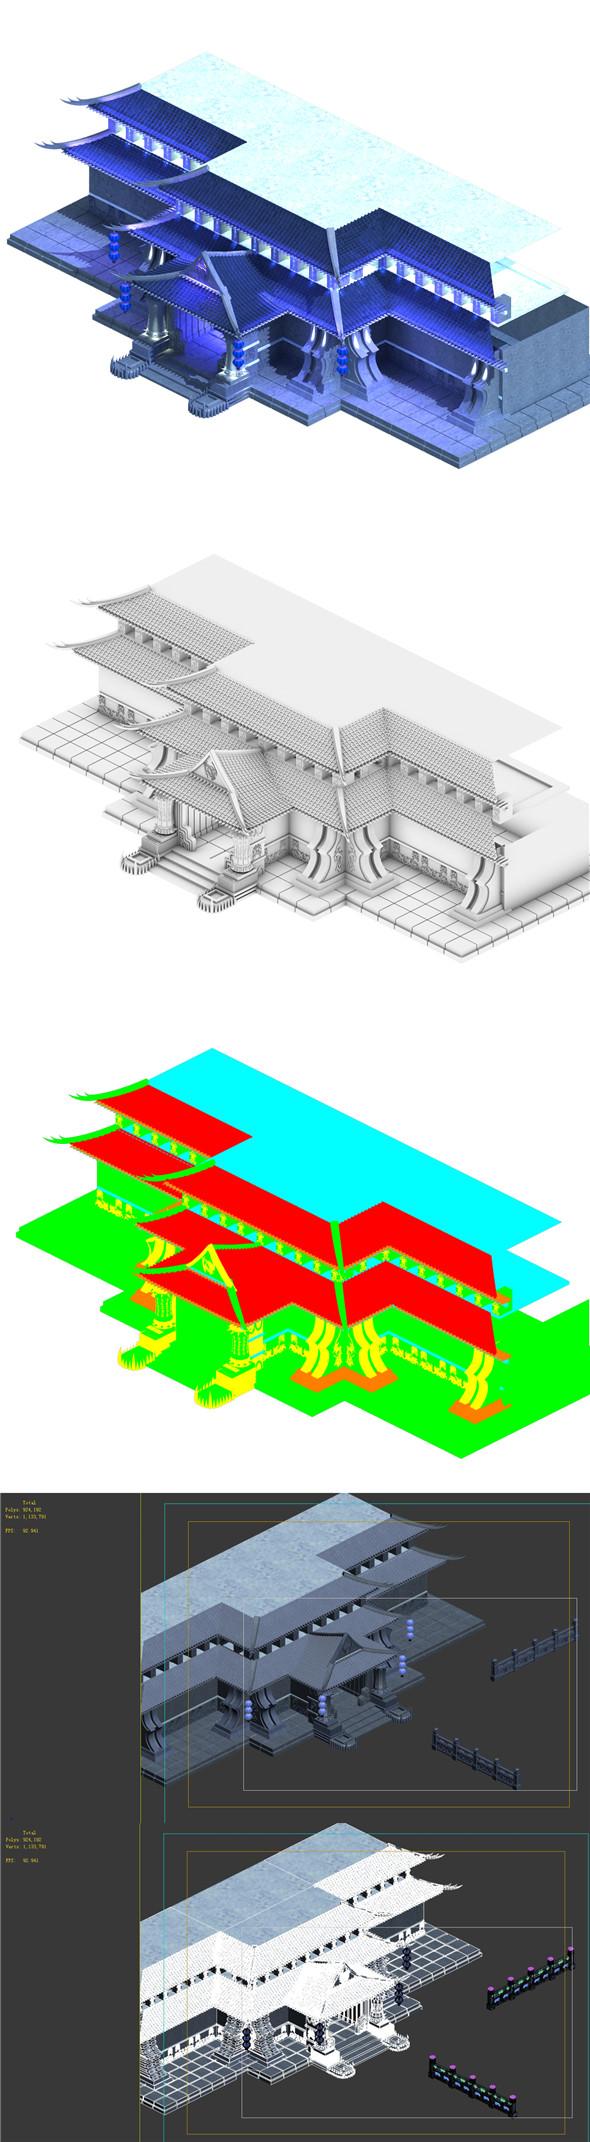 Magic - the main building - 3DOcean Item for Sale